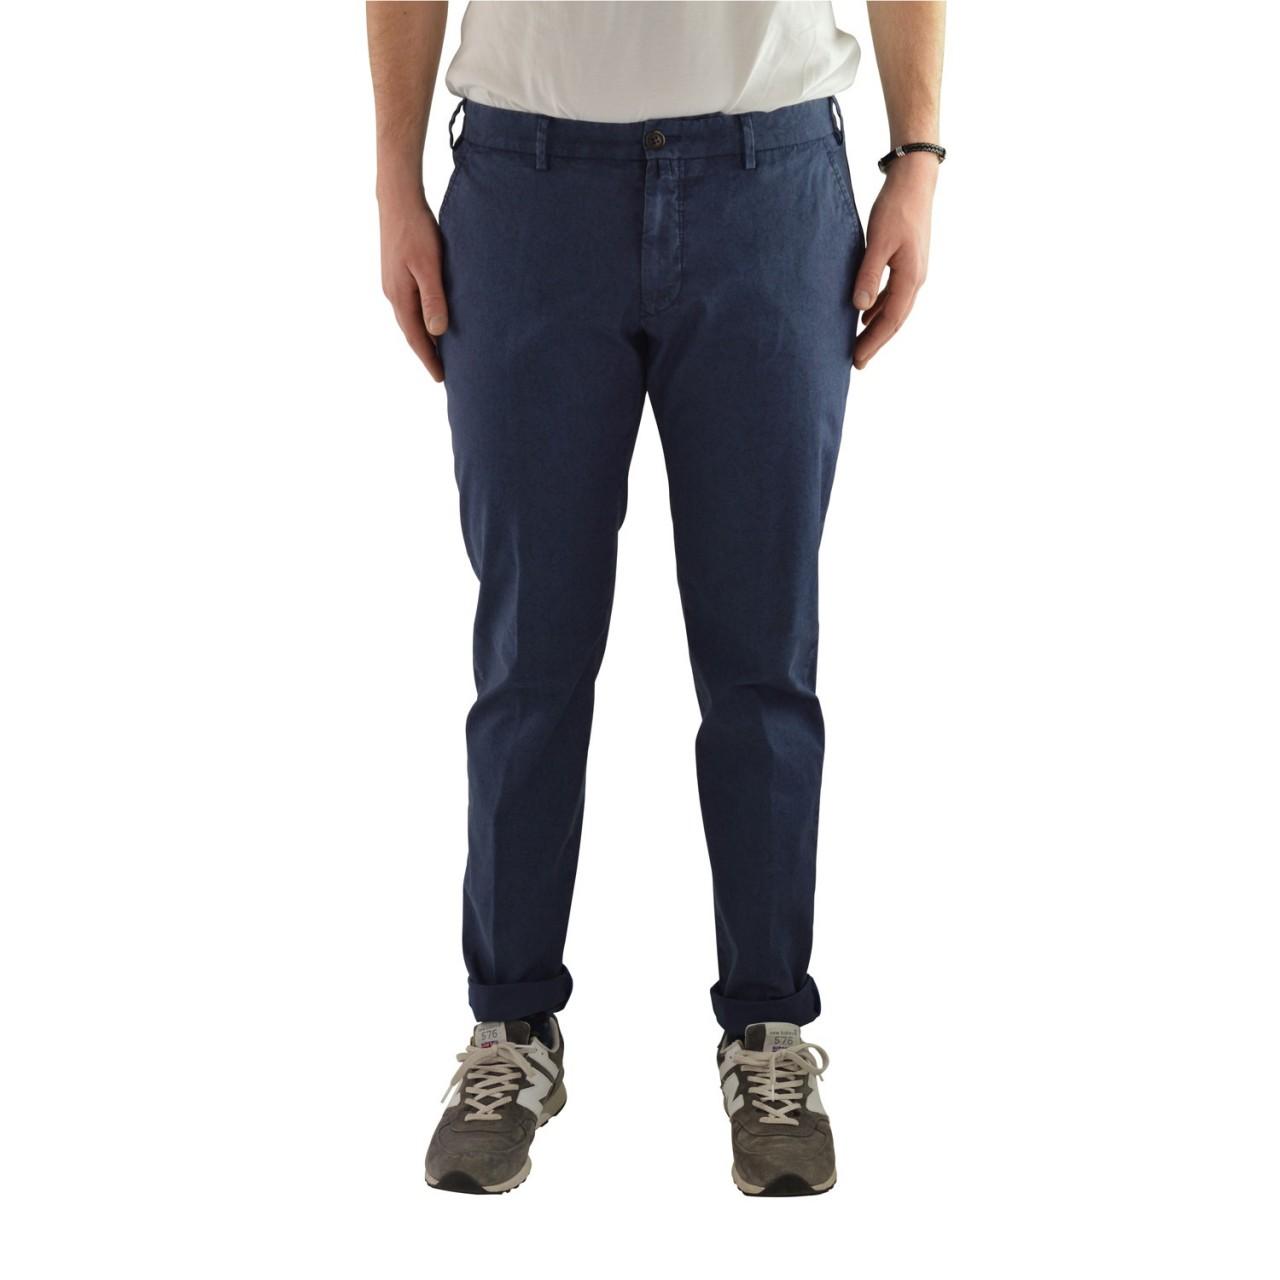 Verdera Uomo Pantalone Verdera Uomo Superslim Fantasia Stretch 500280